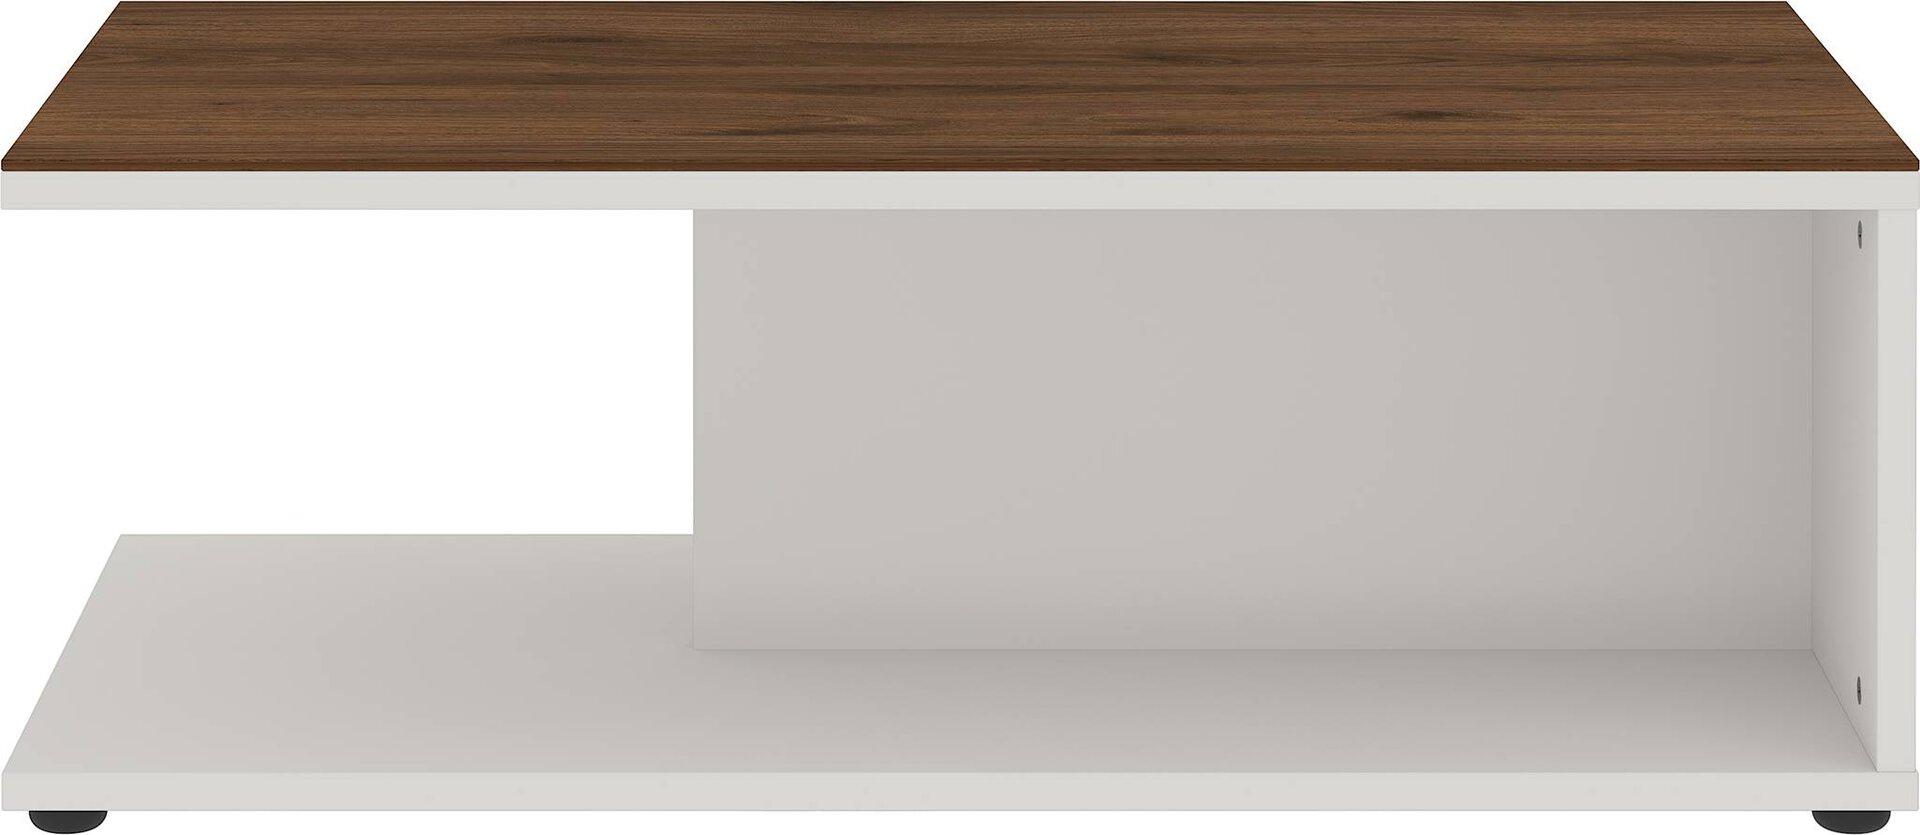 Couchtisch GW-CALIFORNIA Germania Holzwerkstoff mehrfarbig 59 x 39 x 109 cm